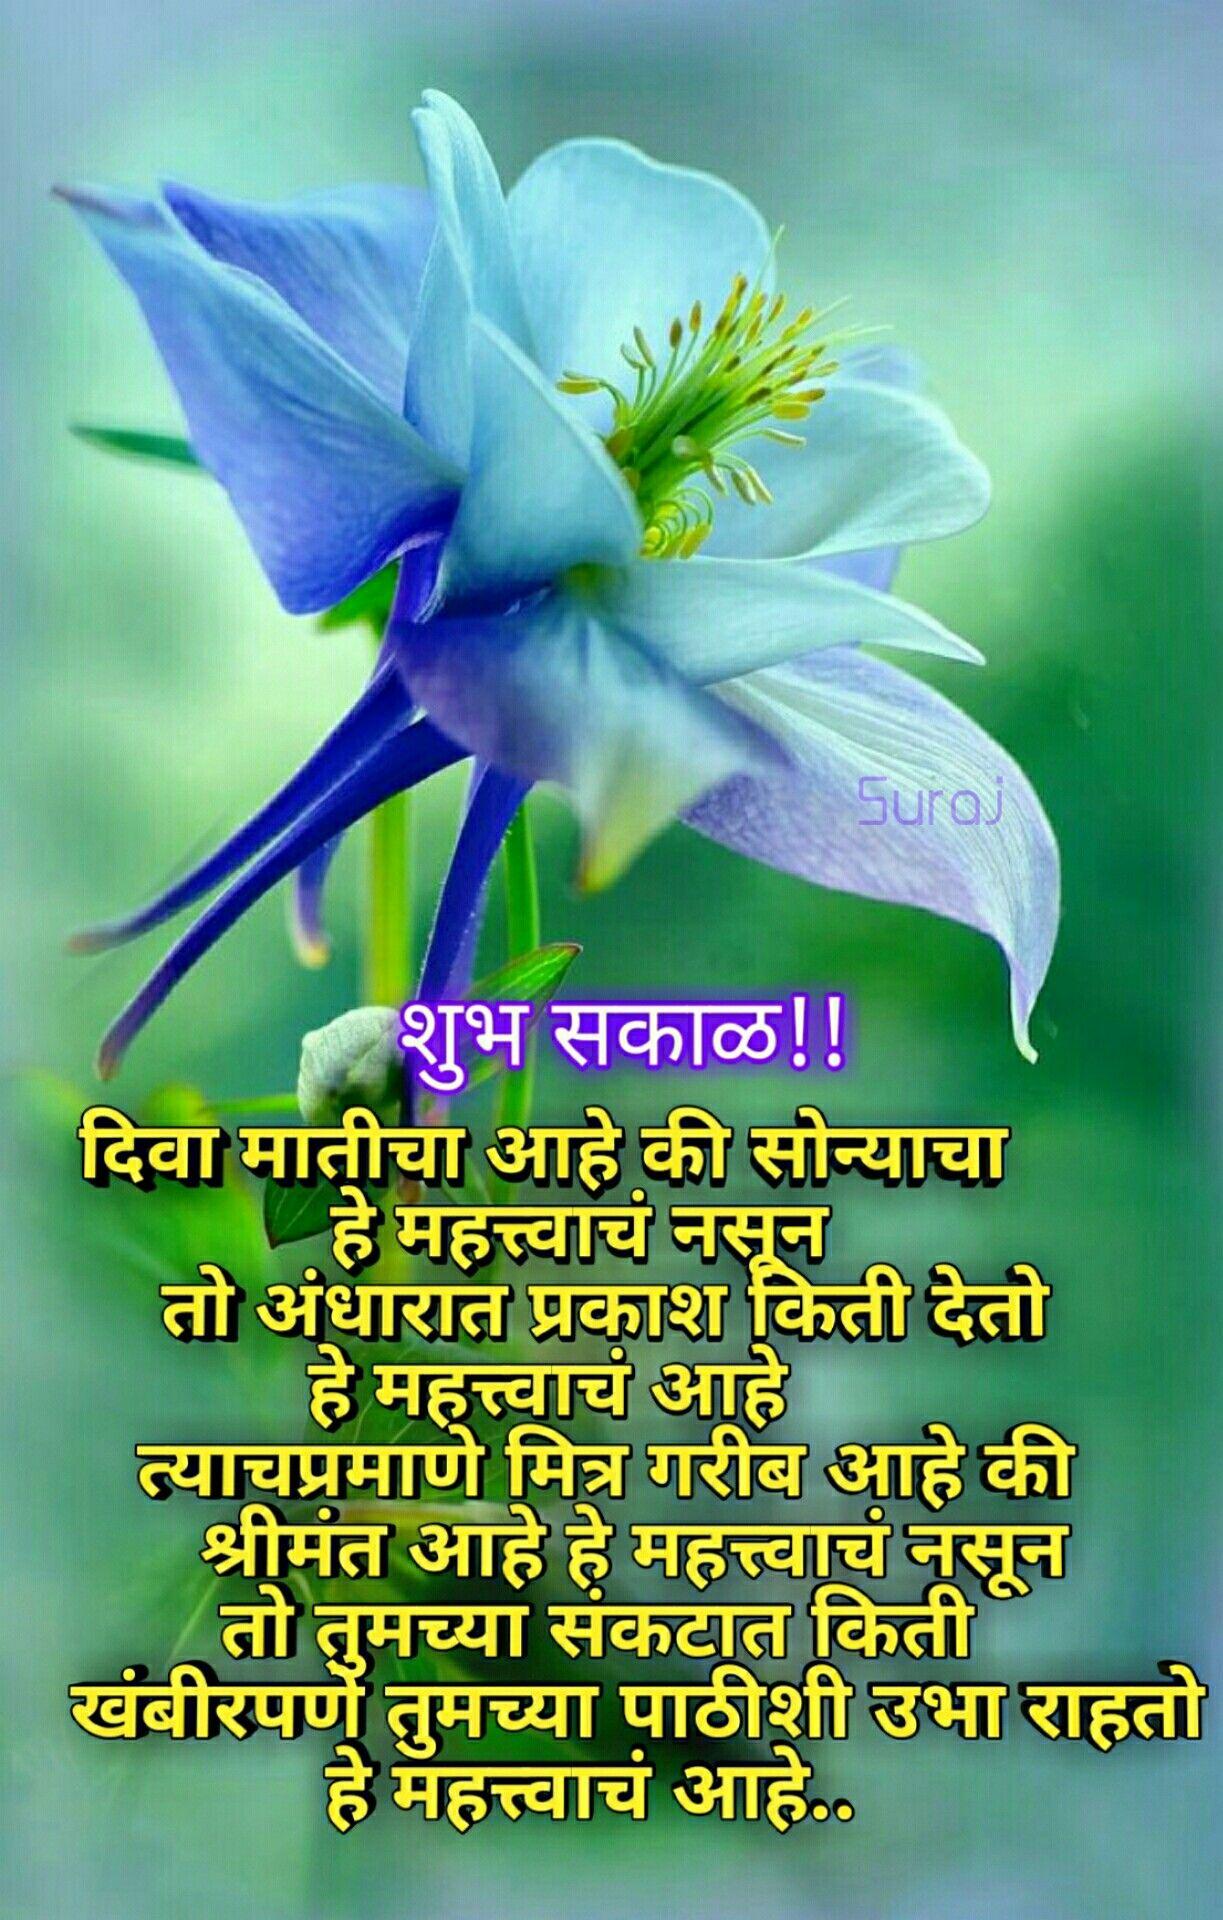 Good Morning Marathi Mornings In 2019 Good Morning Plants Garden